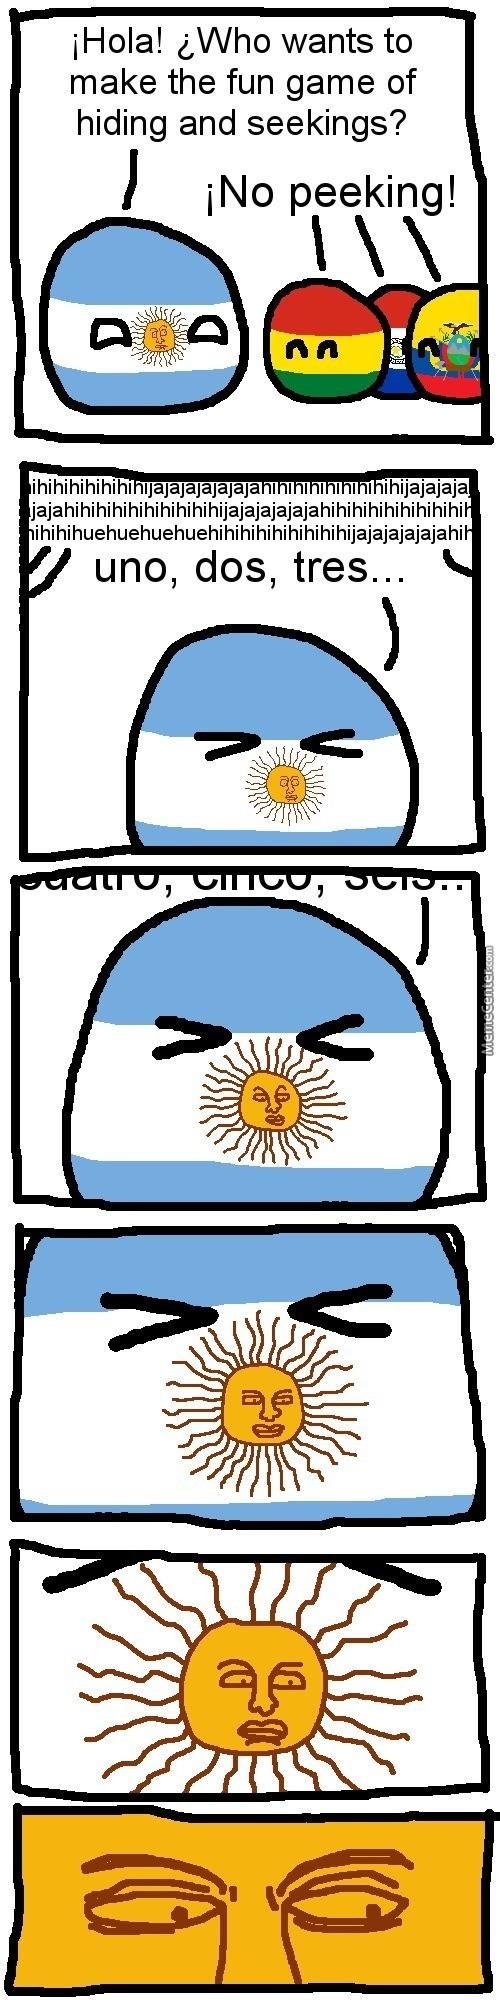 ¿¡ No Peeking?!. . Mela! g, Who wants to make the fun game of hiding and seakings? f peeking!. it looks like a black guy Polandball argentina funny